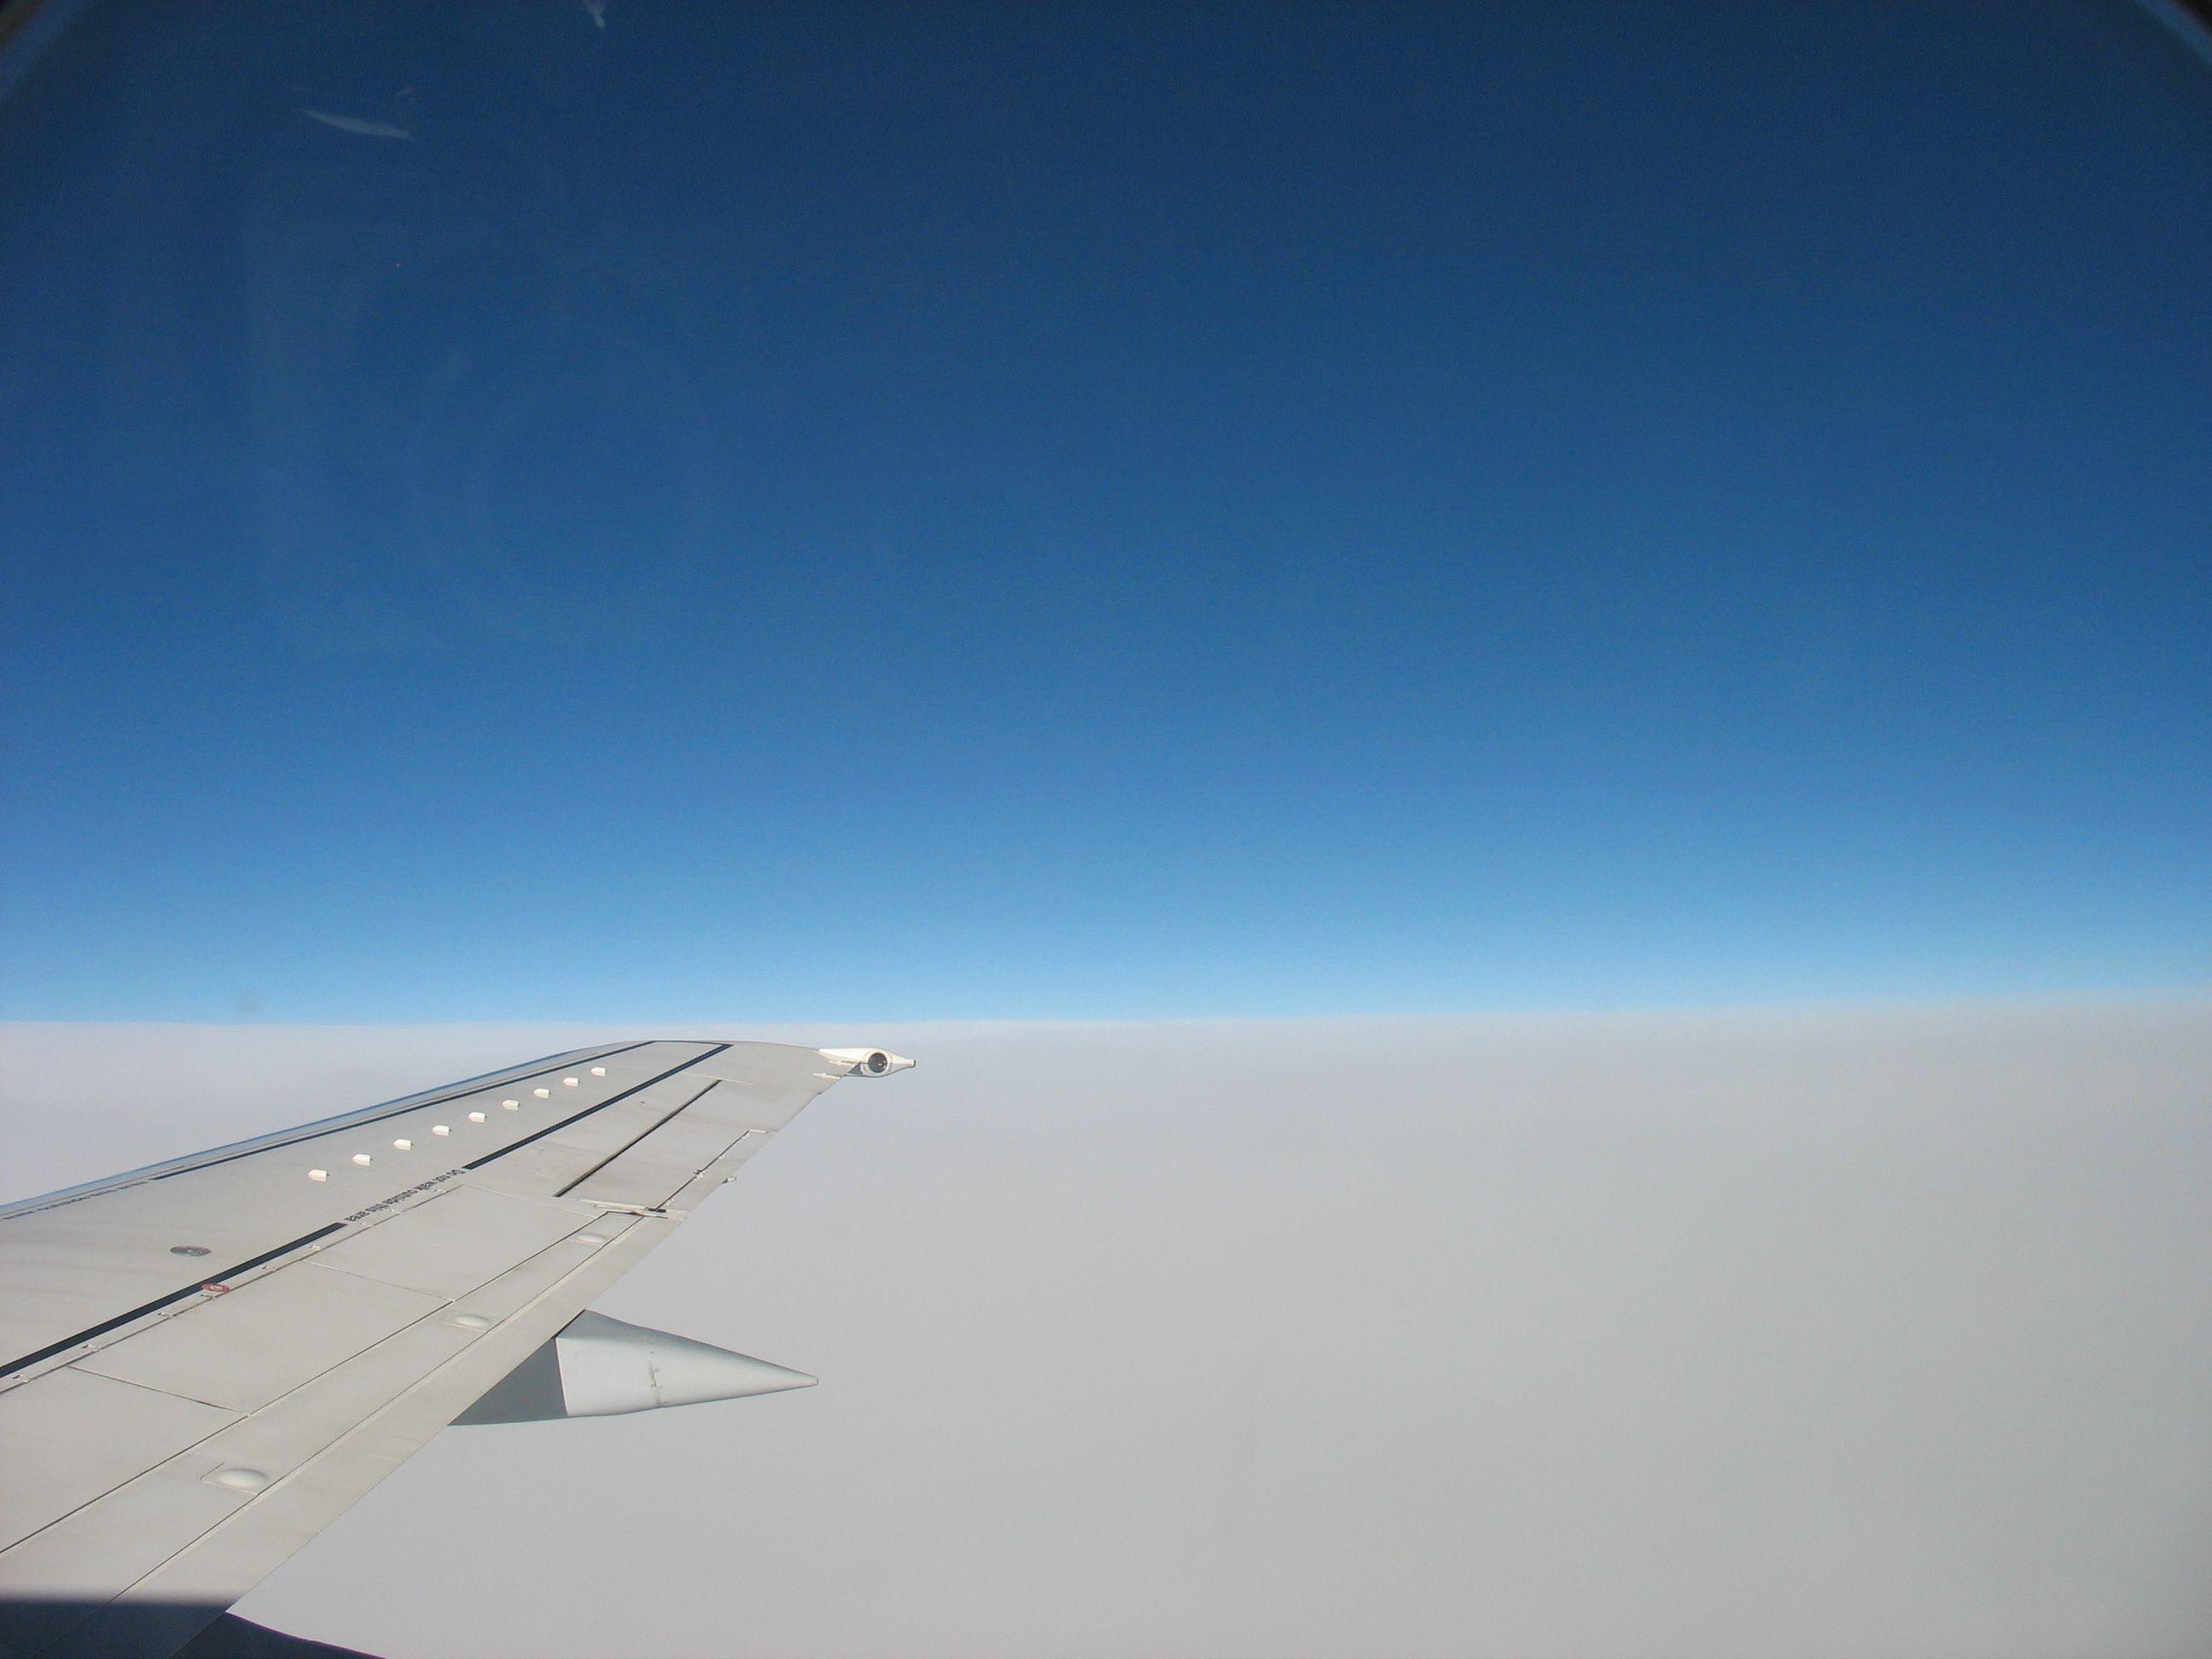 Sky_30000_feet.jpg